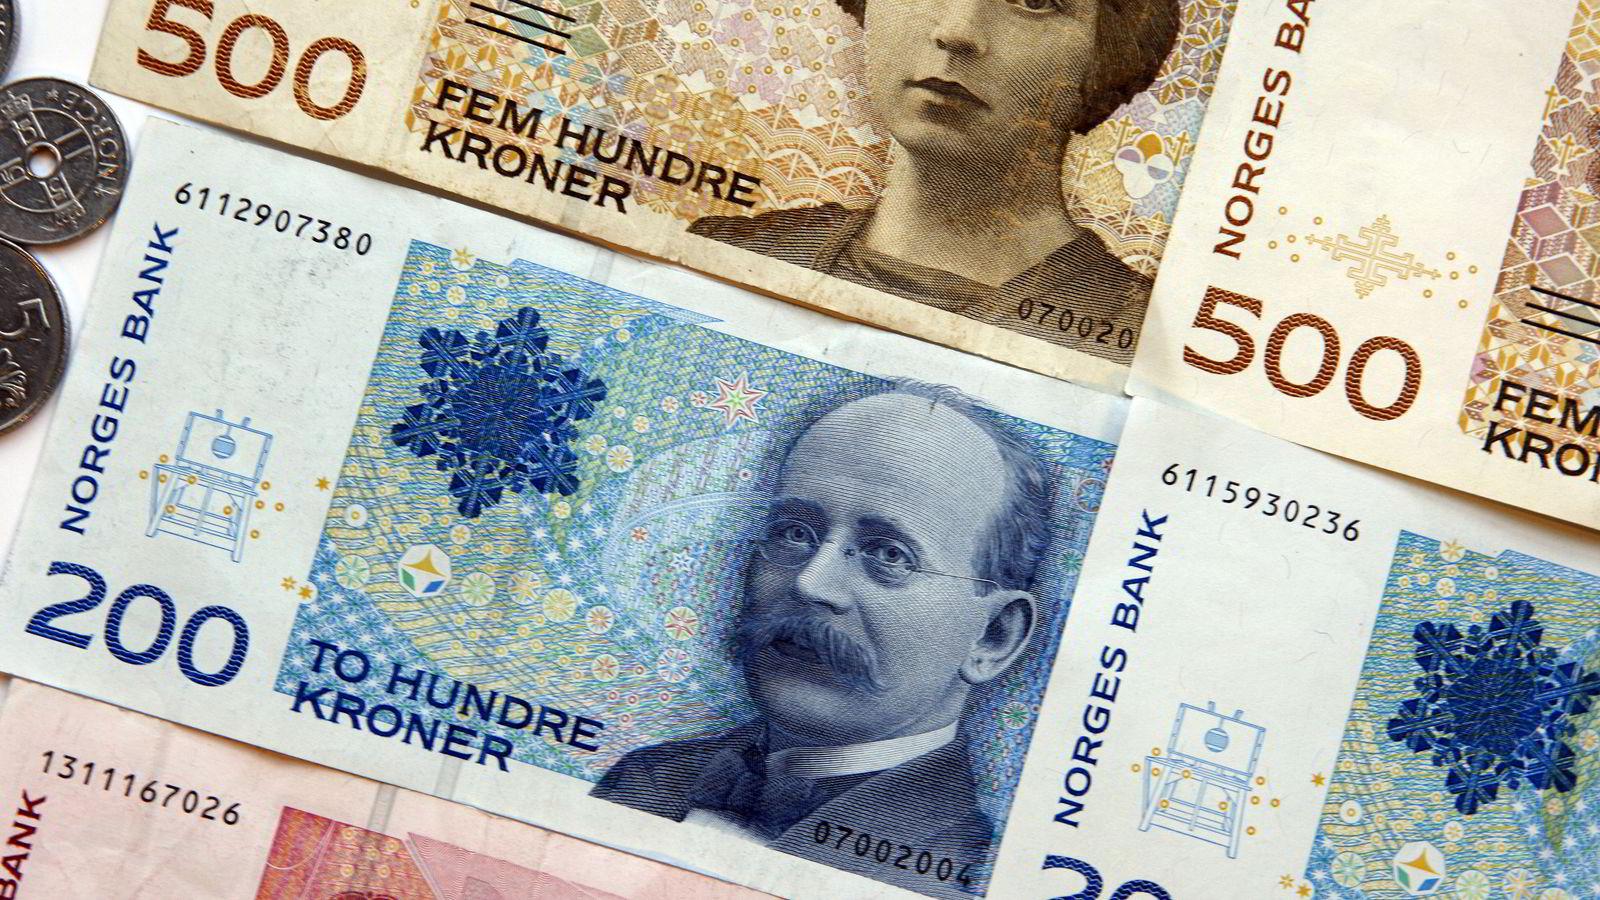 OPPDATERING. Norges Bank gjennomfører en kvartalsvis undersøkelse der banker får spørsmål om utlån til bedrifter og husholdninger. Foto:  Gorm Kallestad  / SCANPIX .